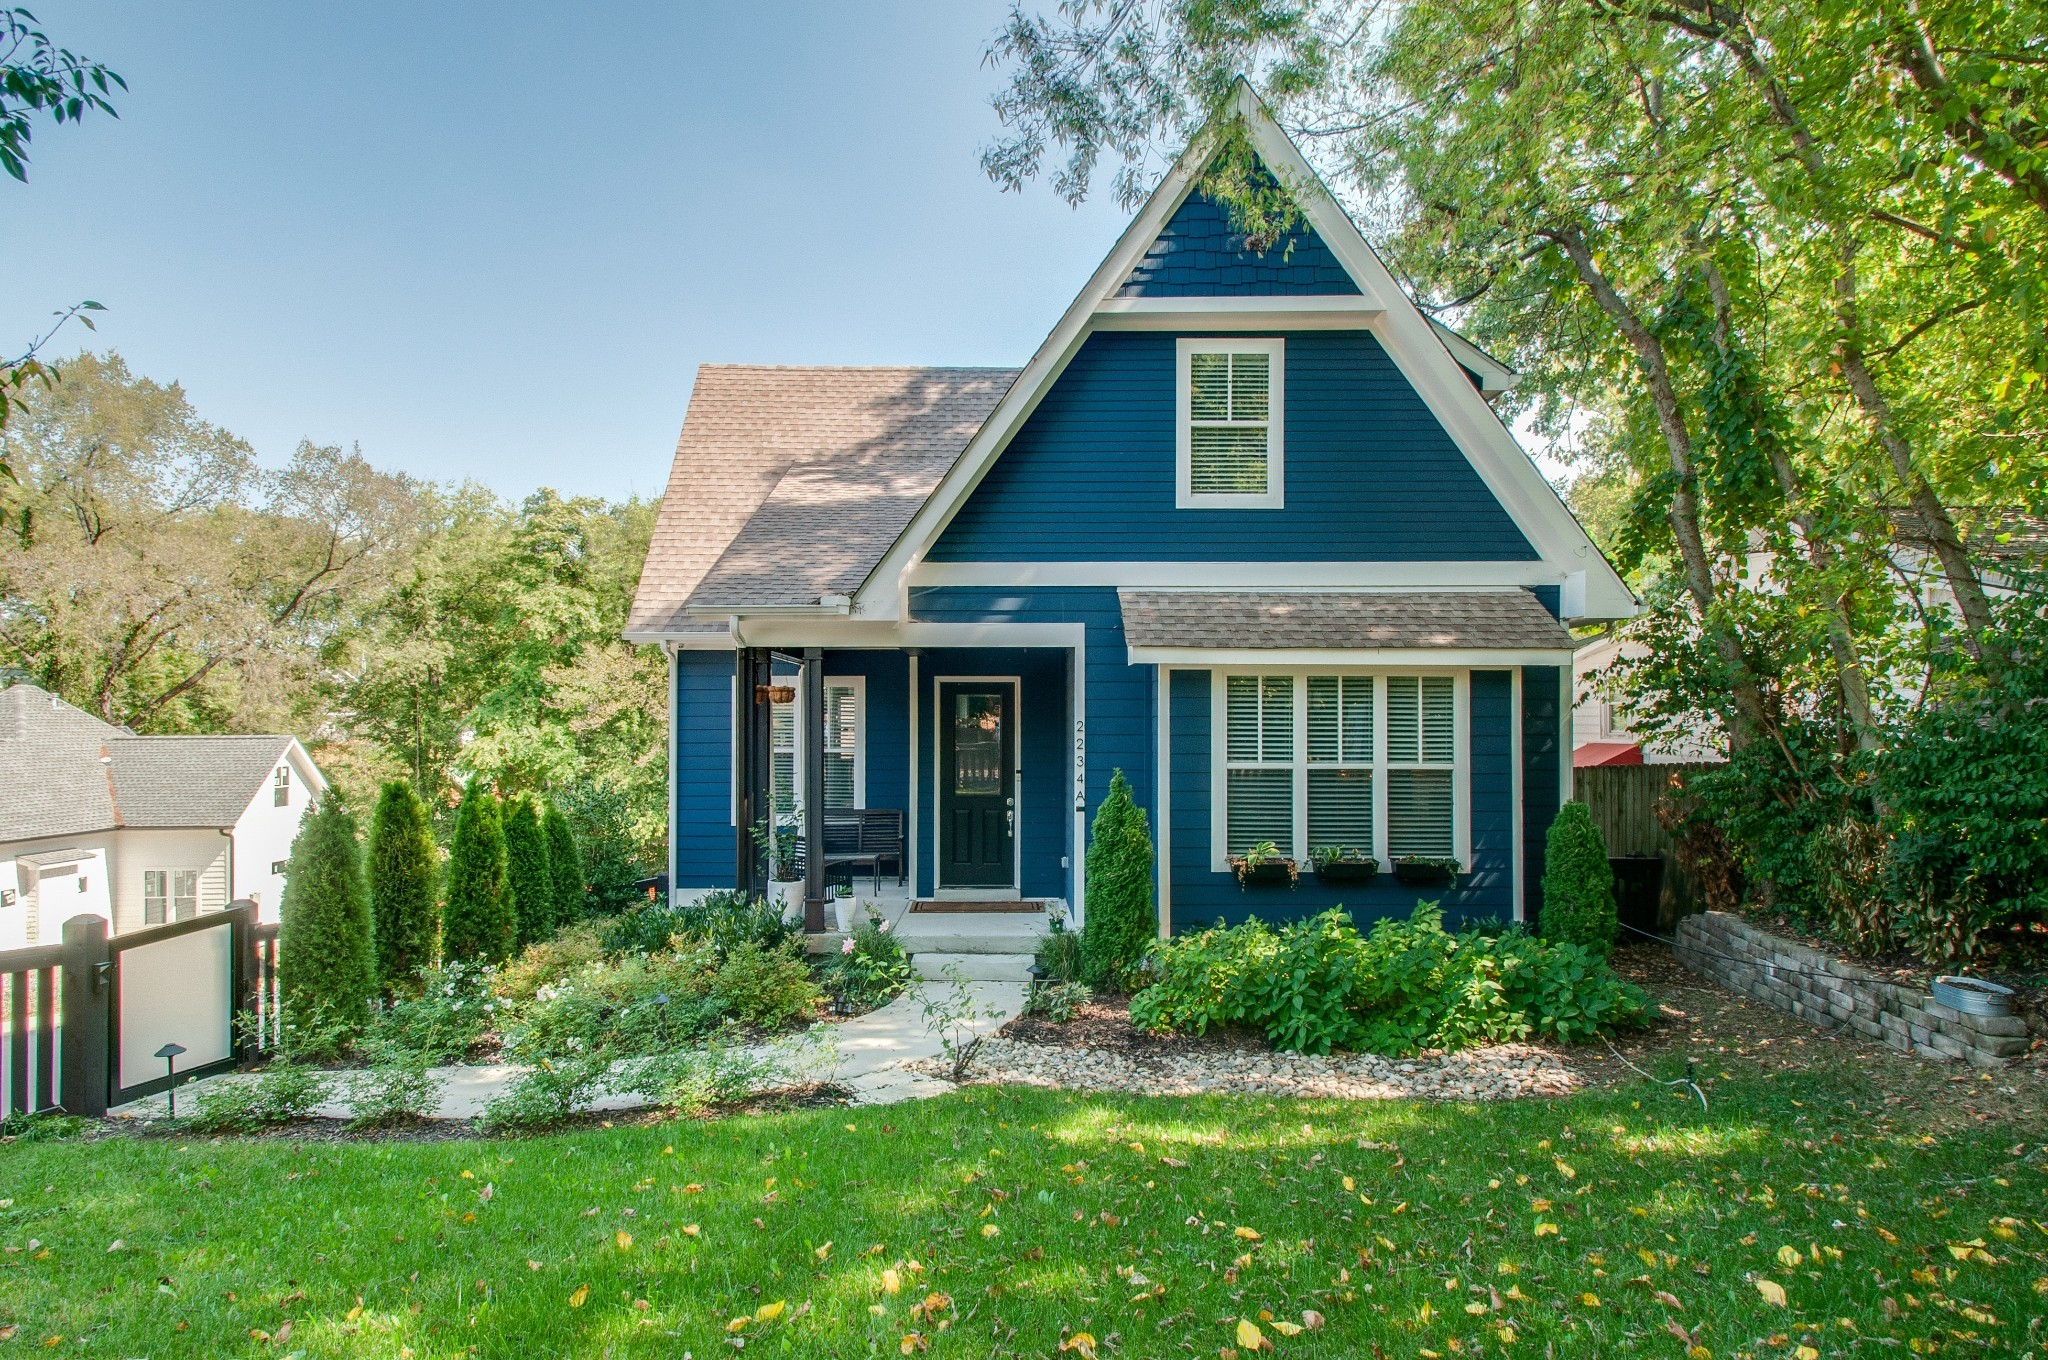 2234A Cruzen Street, Nashville, TN 37211 - Nashville, TN real estate listing